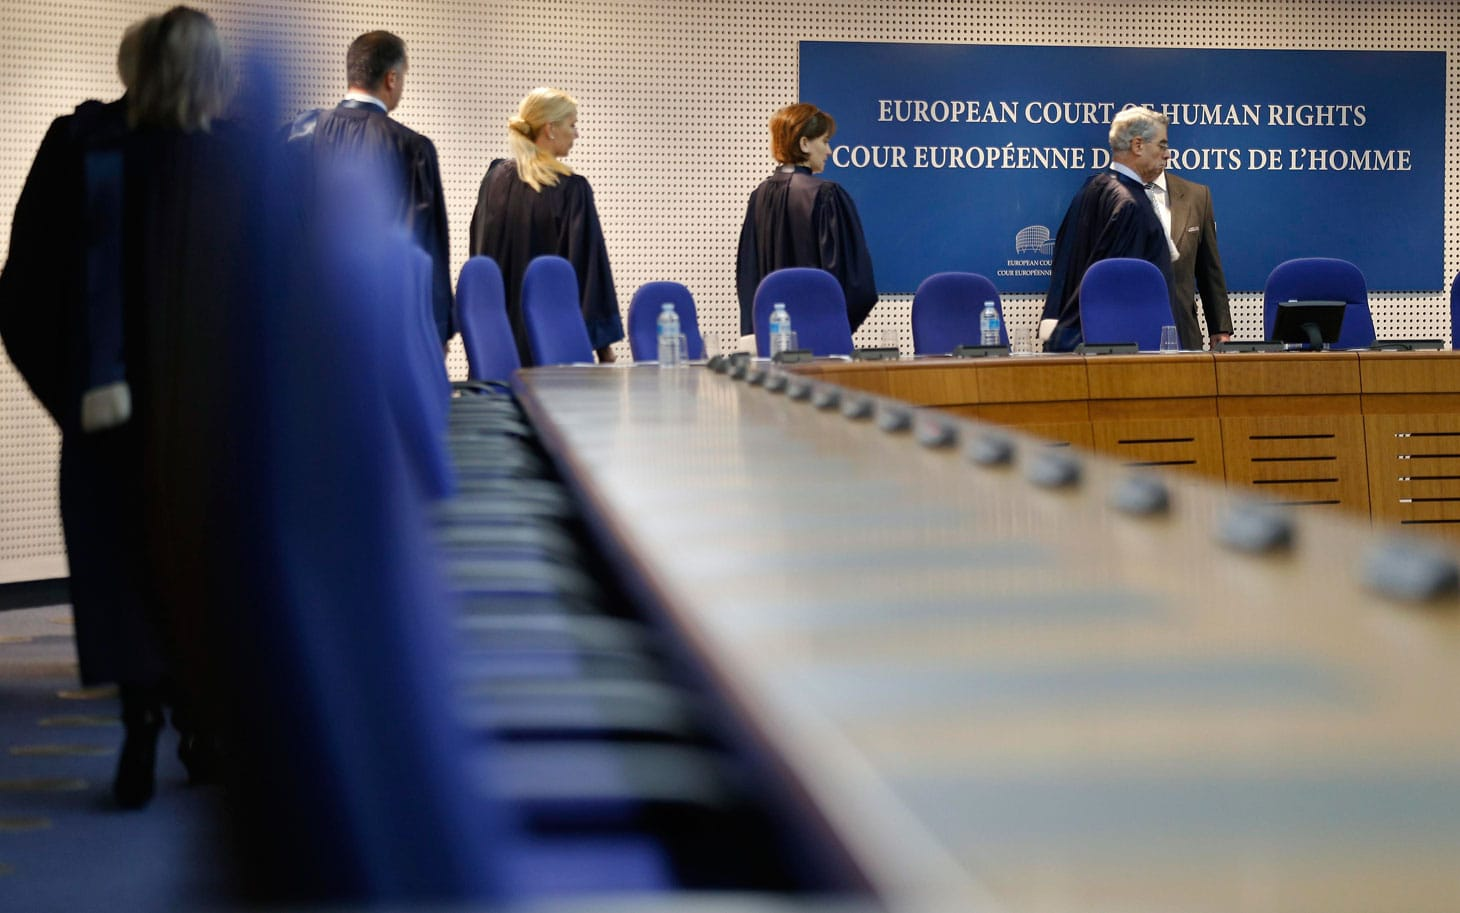 s ab586212df17f78a66aff05ee40847b1d0588988 - Avrupa İnsan Hakları Mahkemesi Kararları Işığında İfade Özgürlüğü